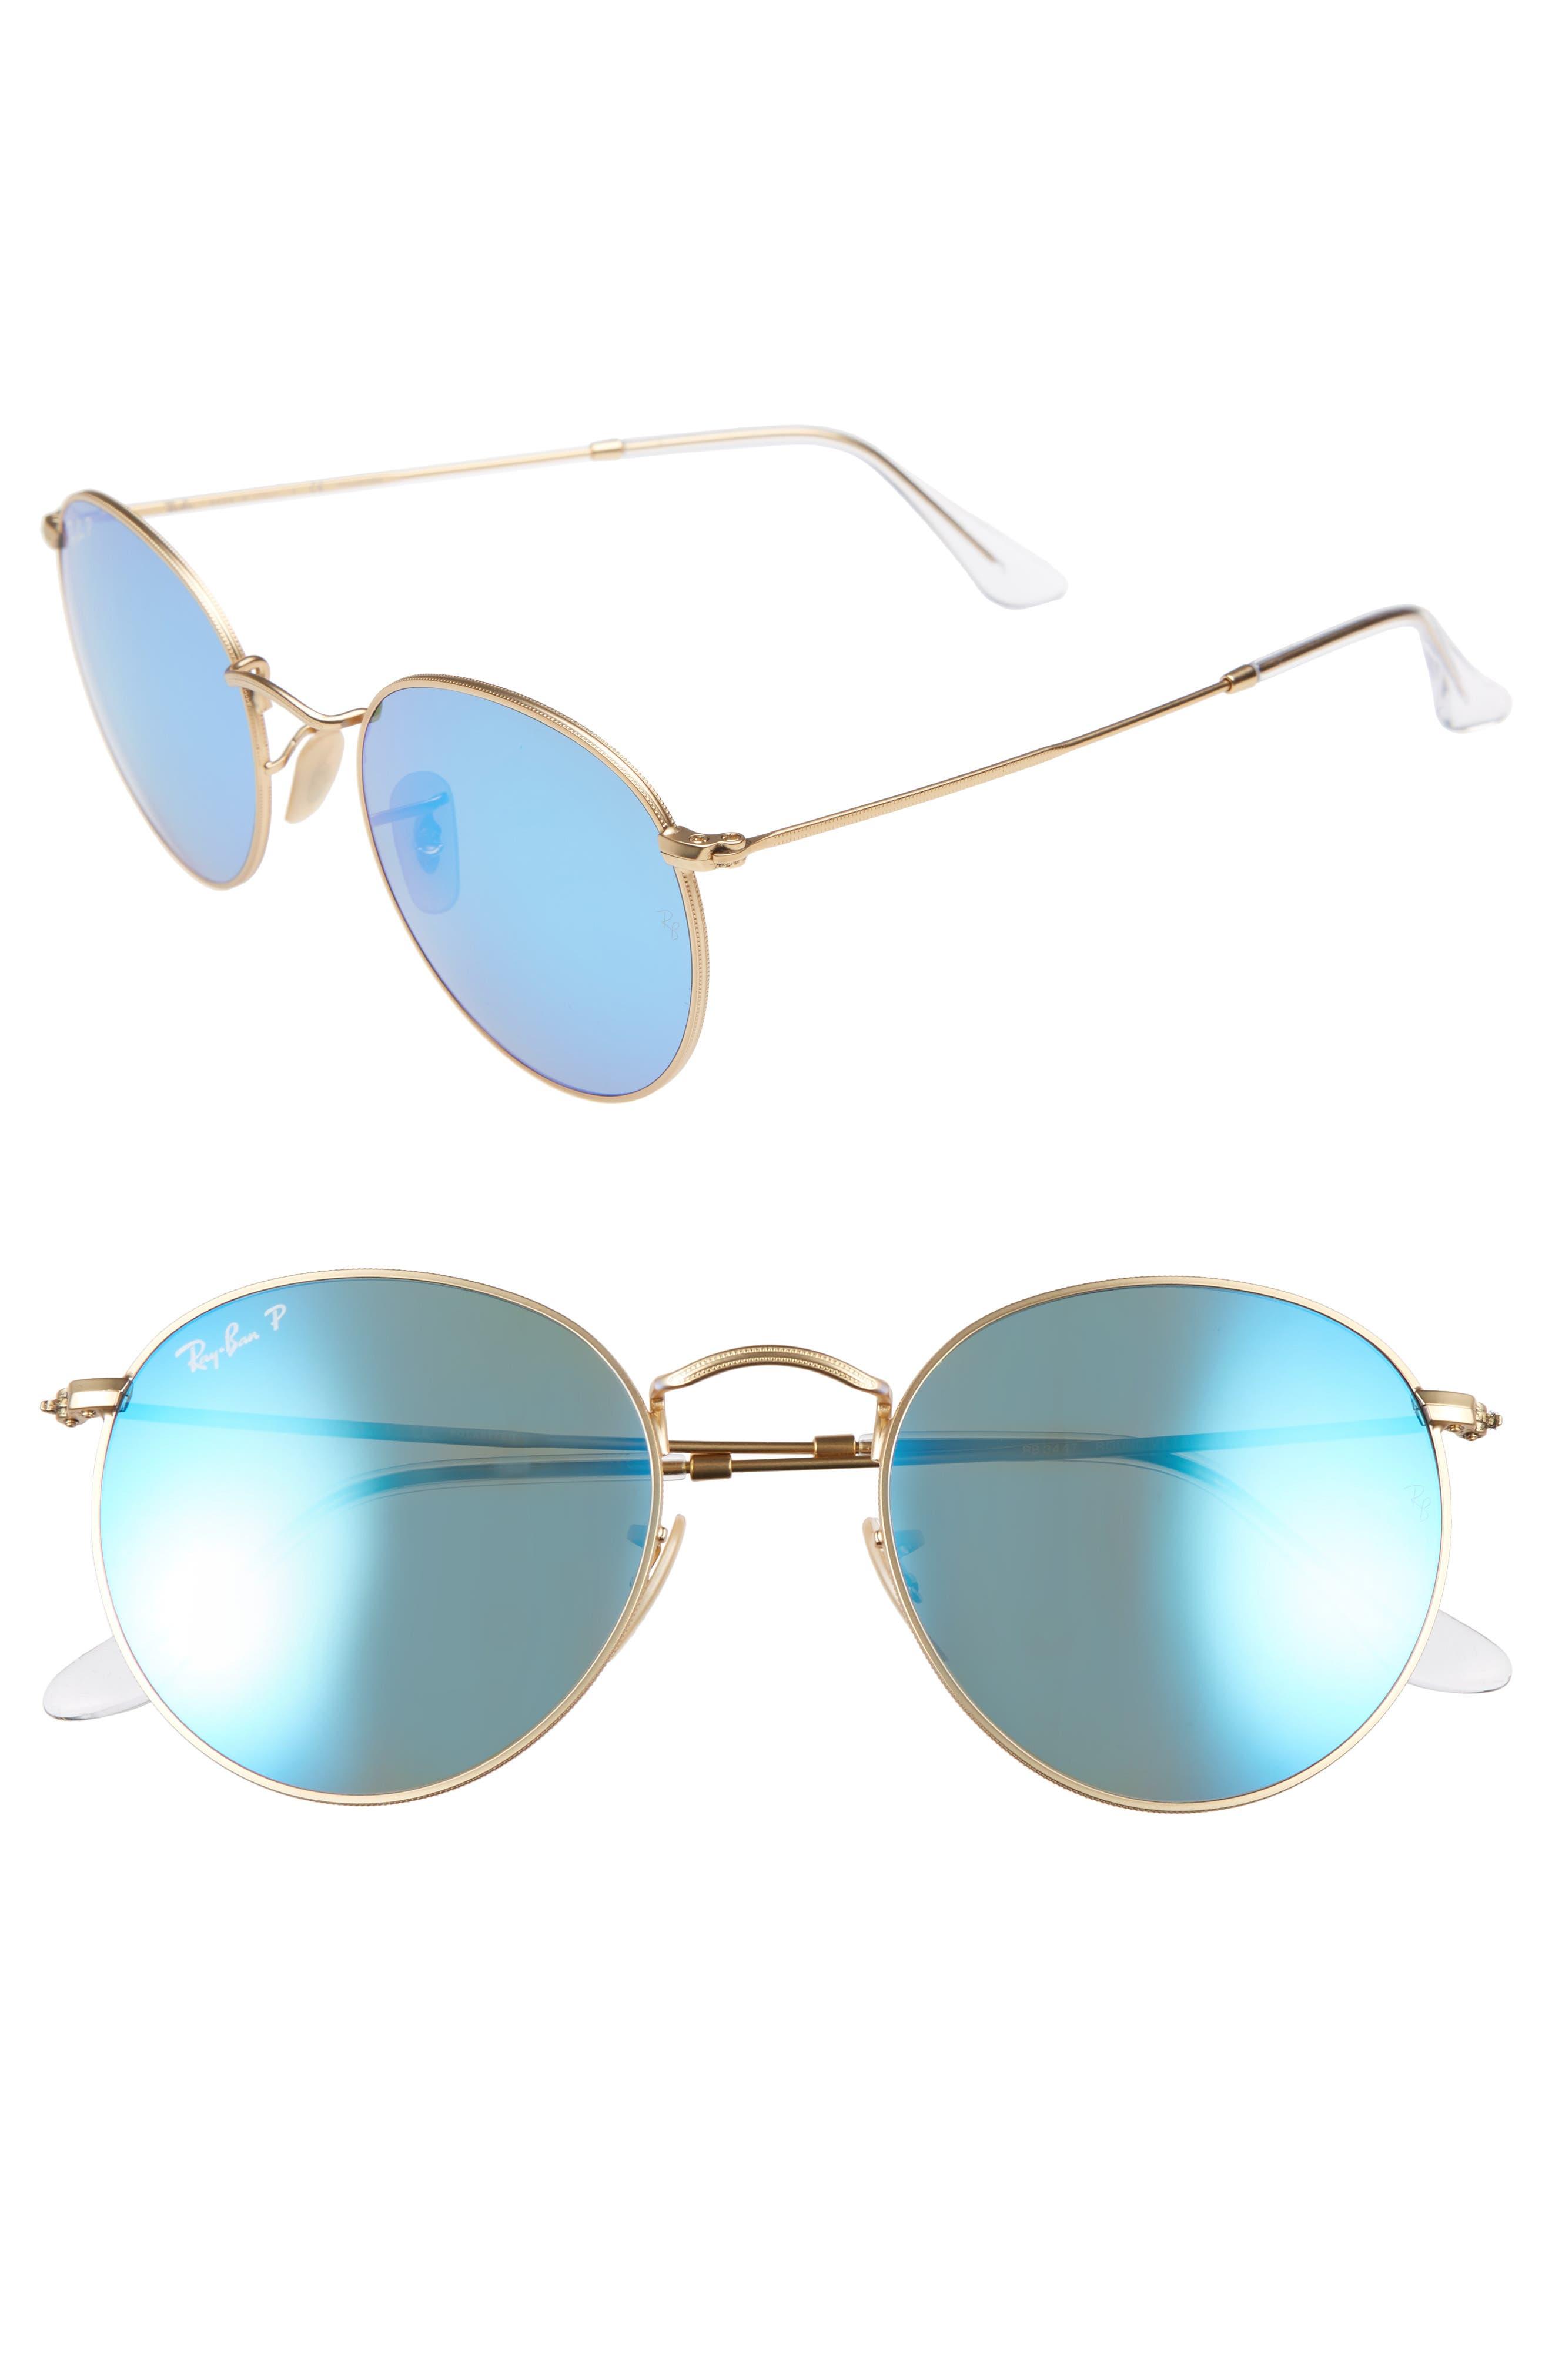 53mm Polarized Round Retro Sunglasses,                             Main thumbnail 1, color,                             Blue Mirror